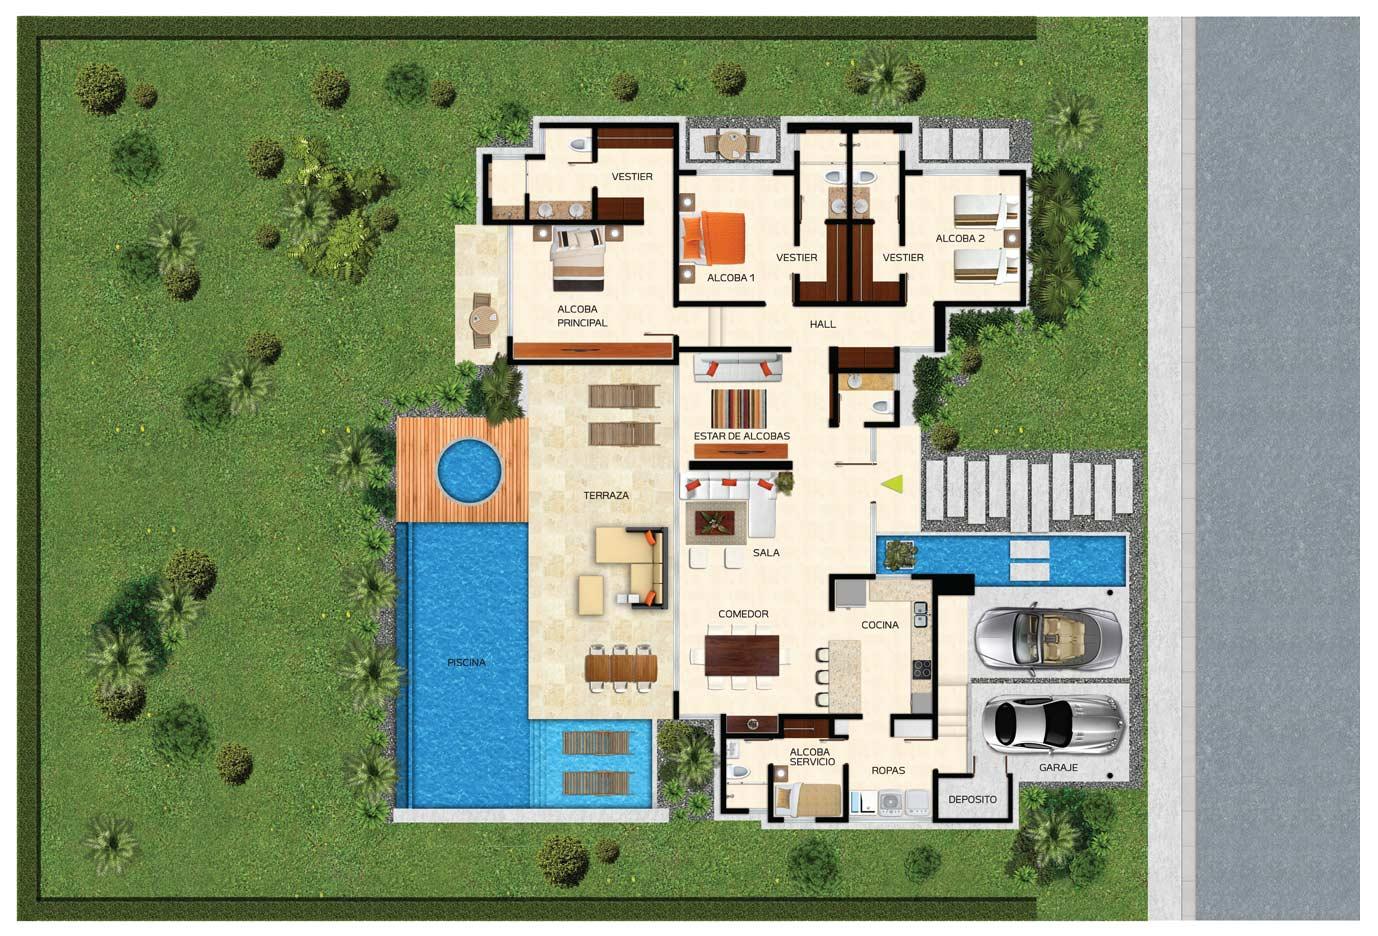 Planta de casa de campo enlaces free ms de ideas for Planos de casas de campo modernas